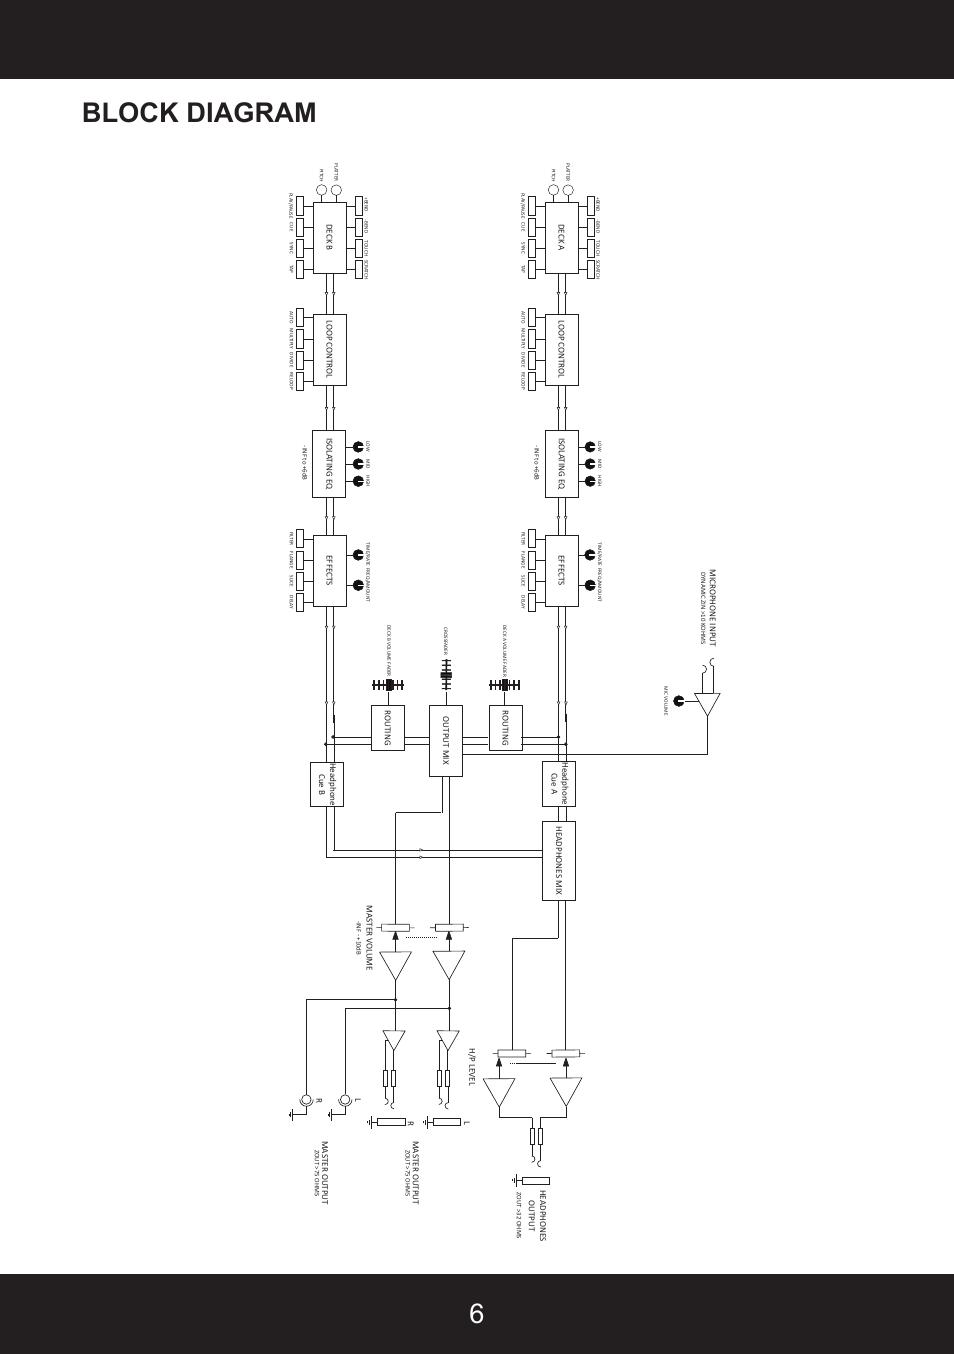 6block diagram